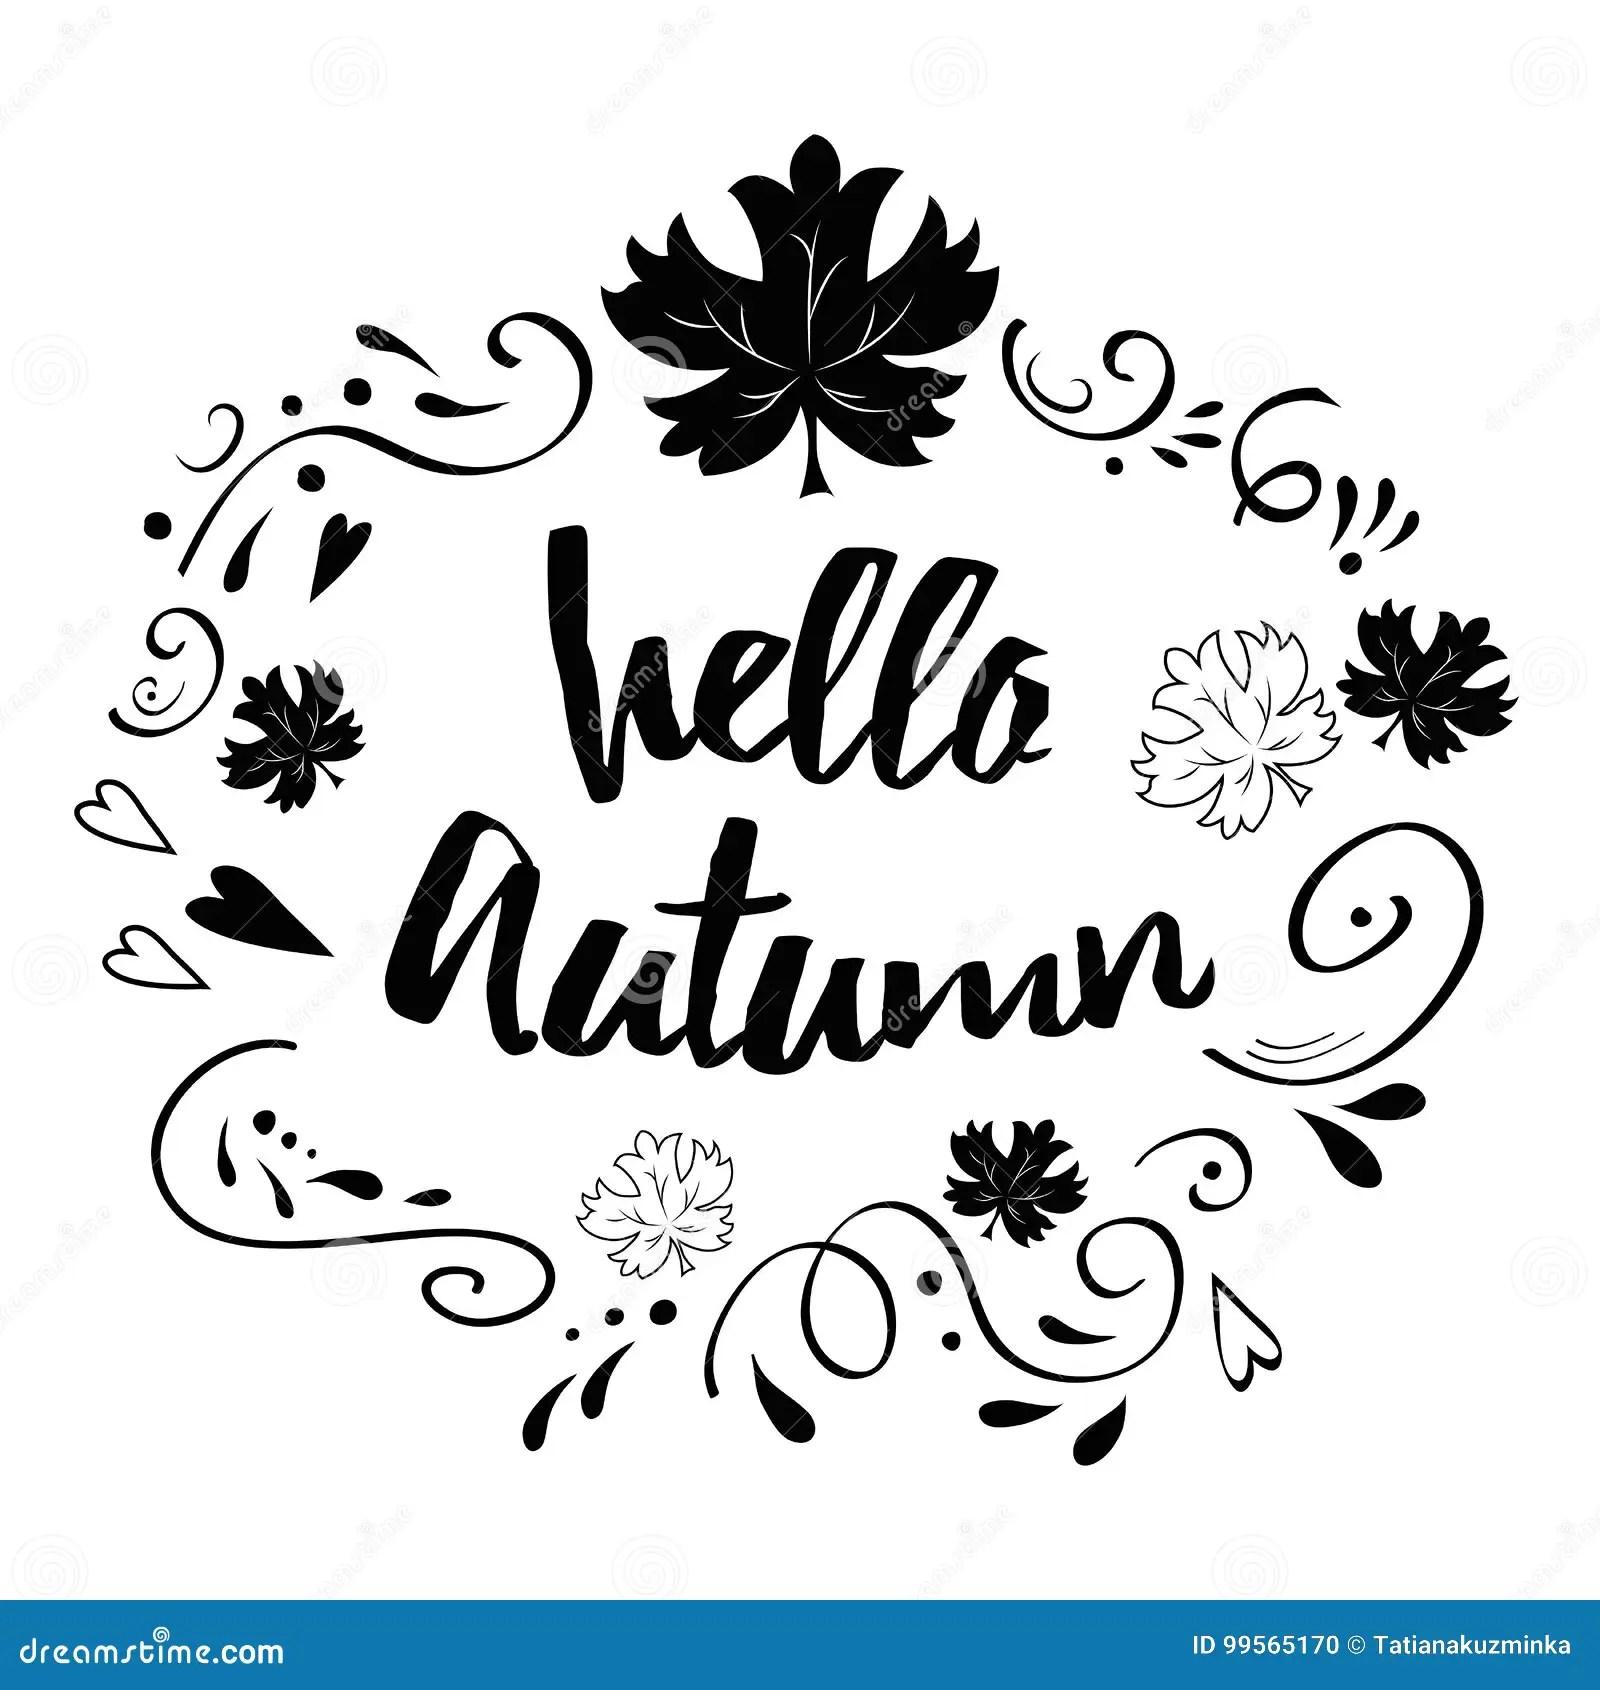 Typographic Banner With Phrase Hello Autumn In Black